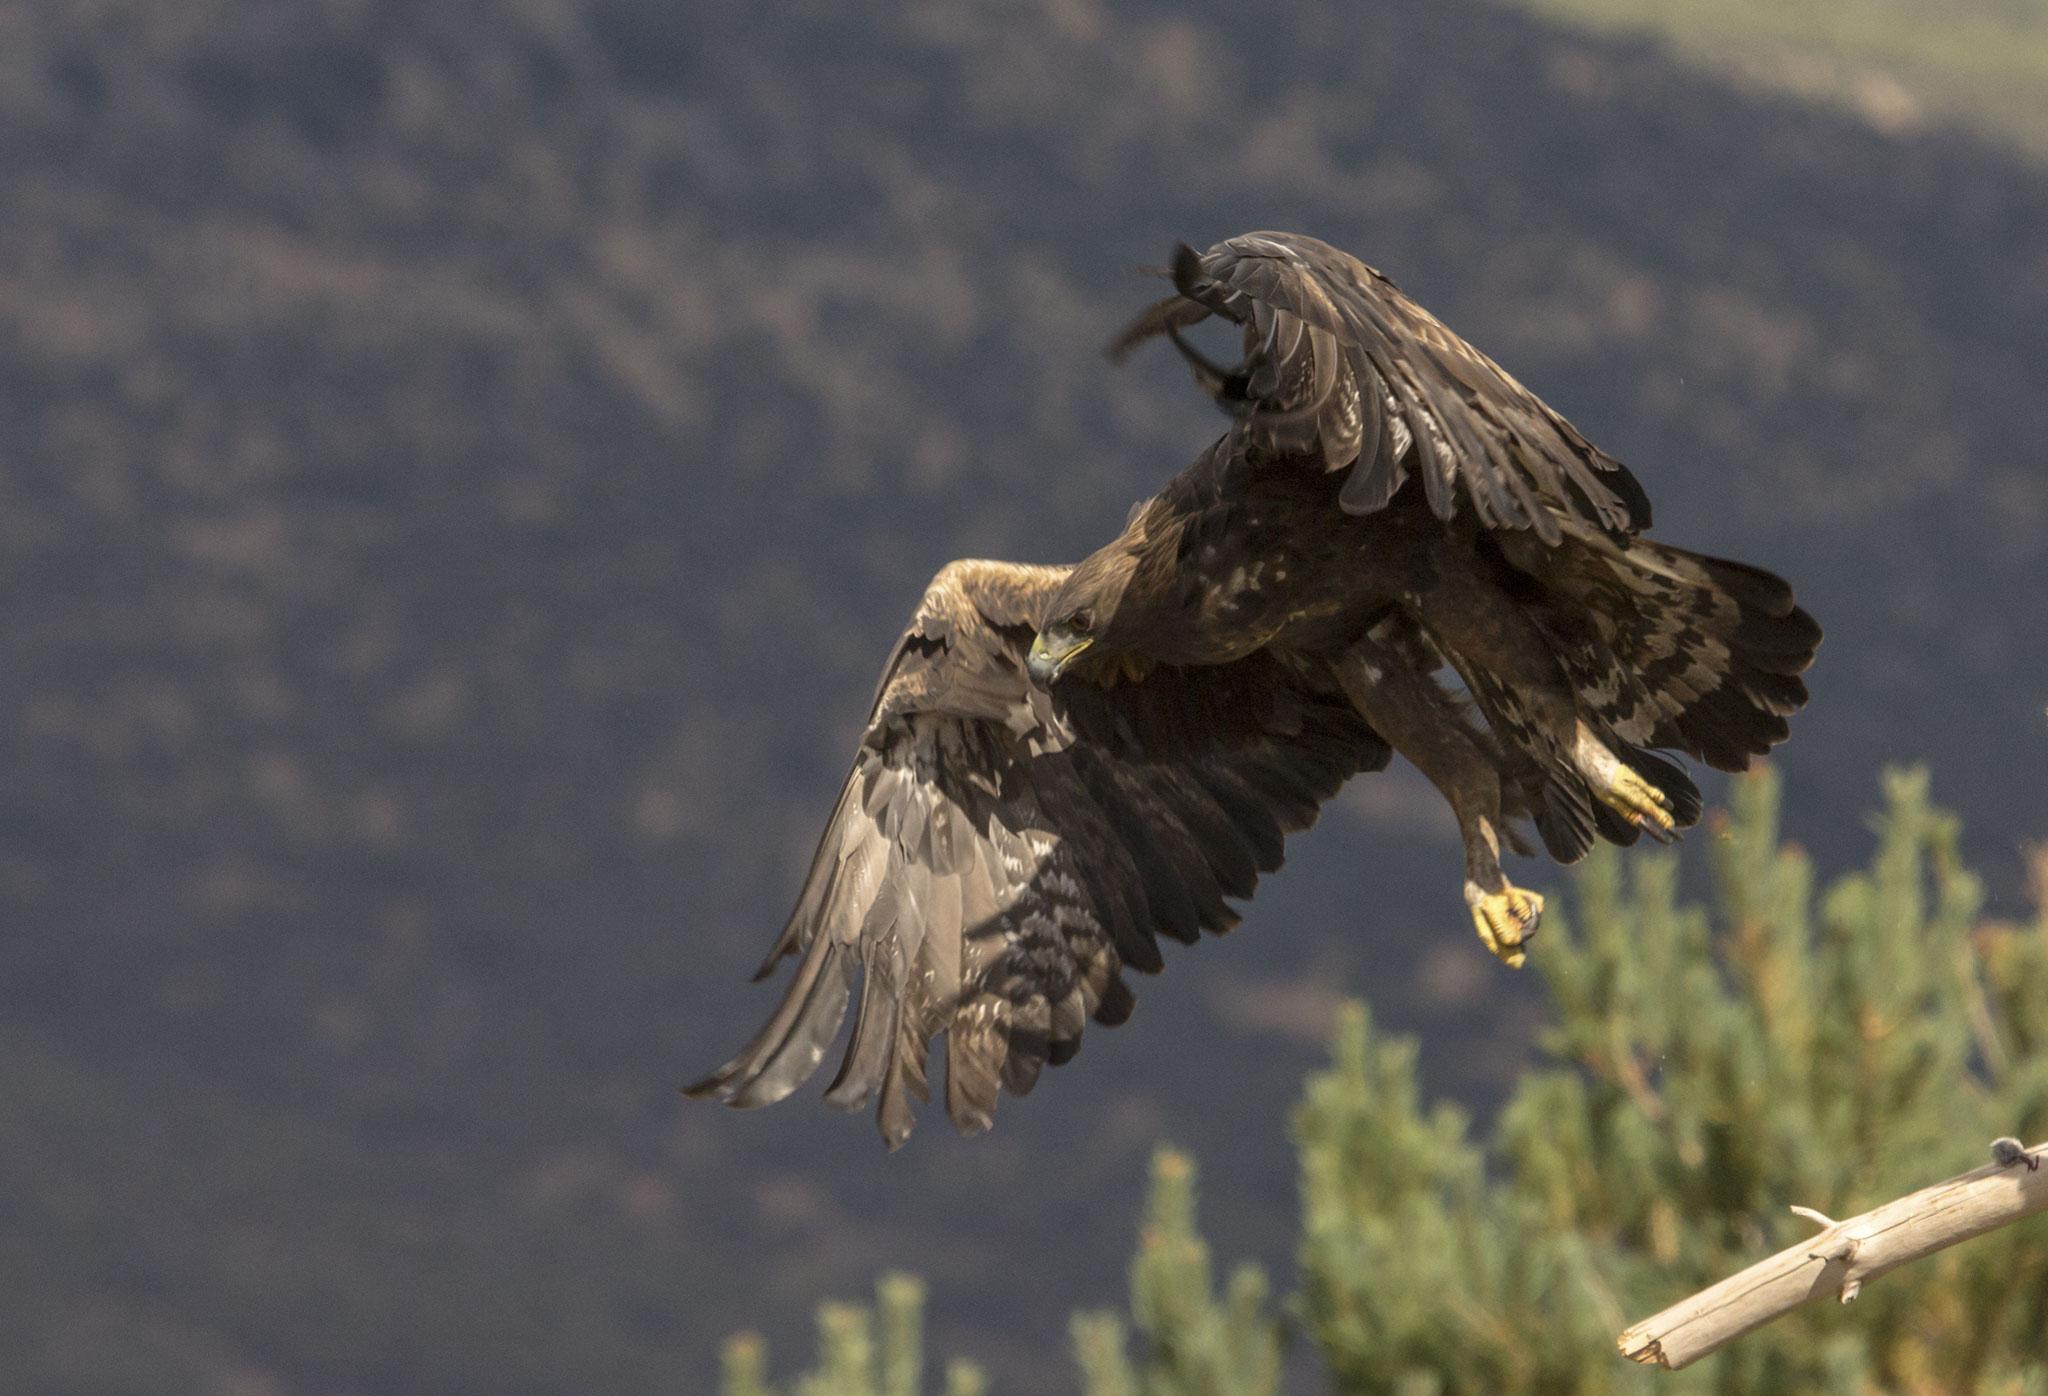 Aquila reale